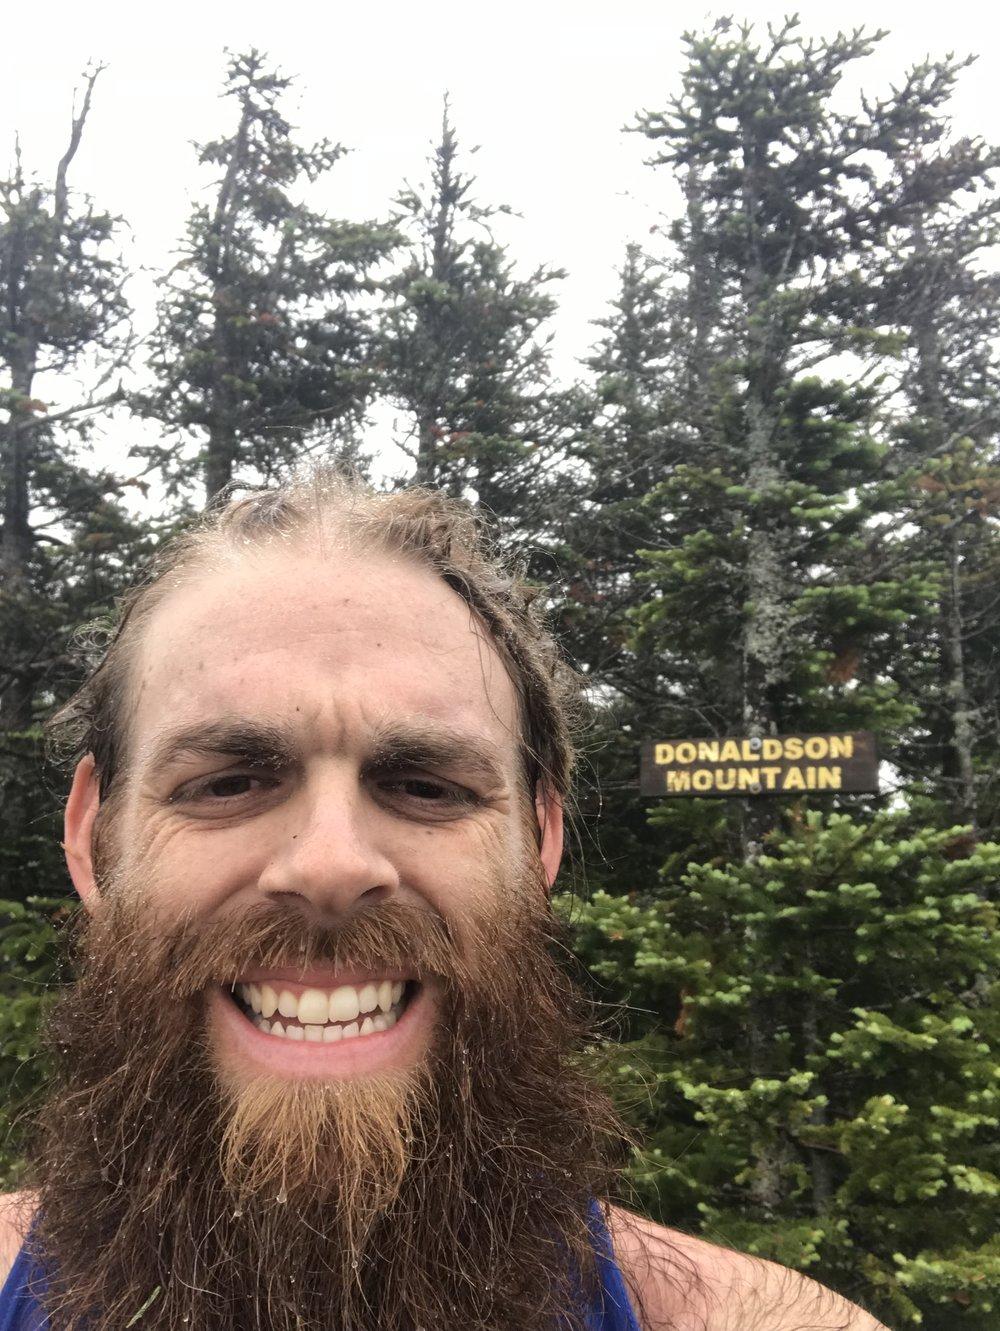 First Peak of the Thru Hike